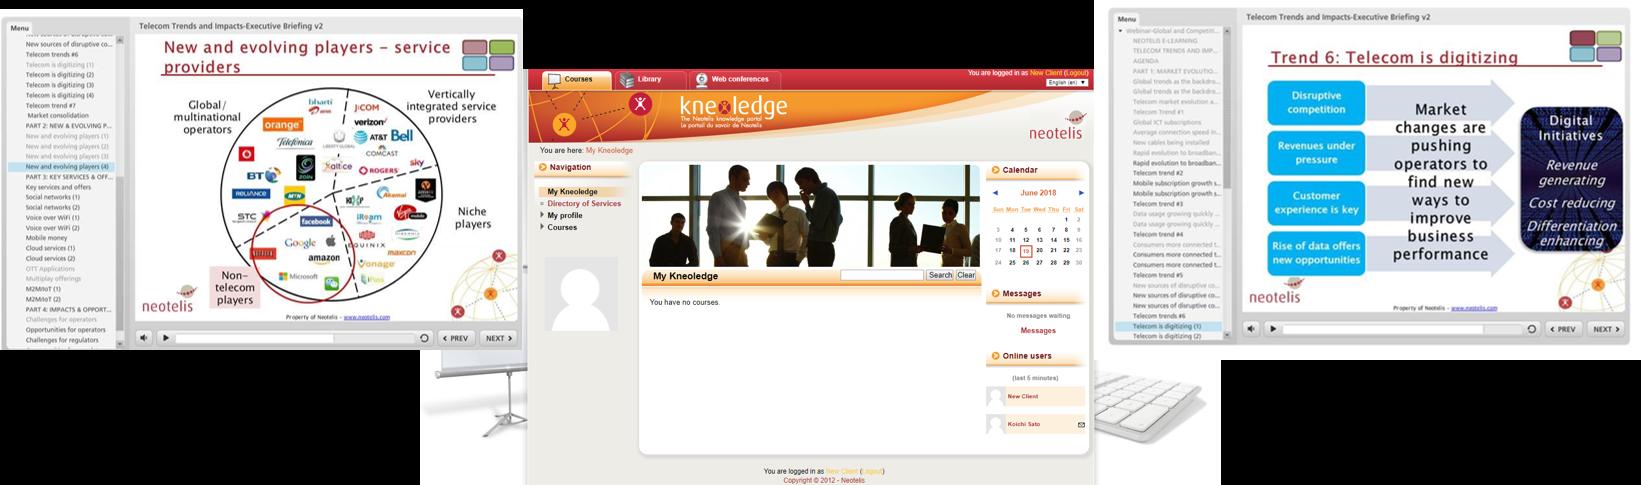 online learning portal graph